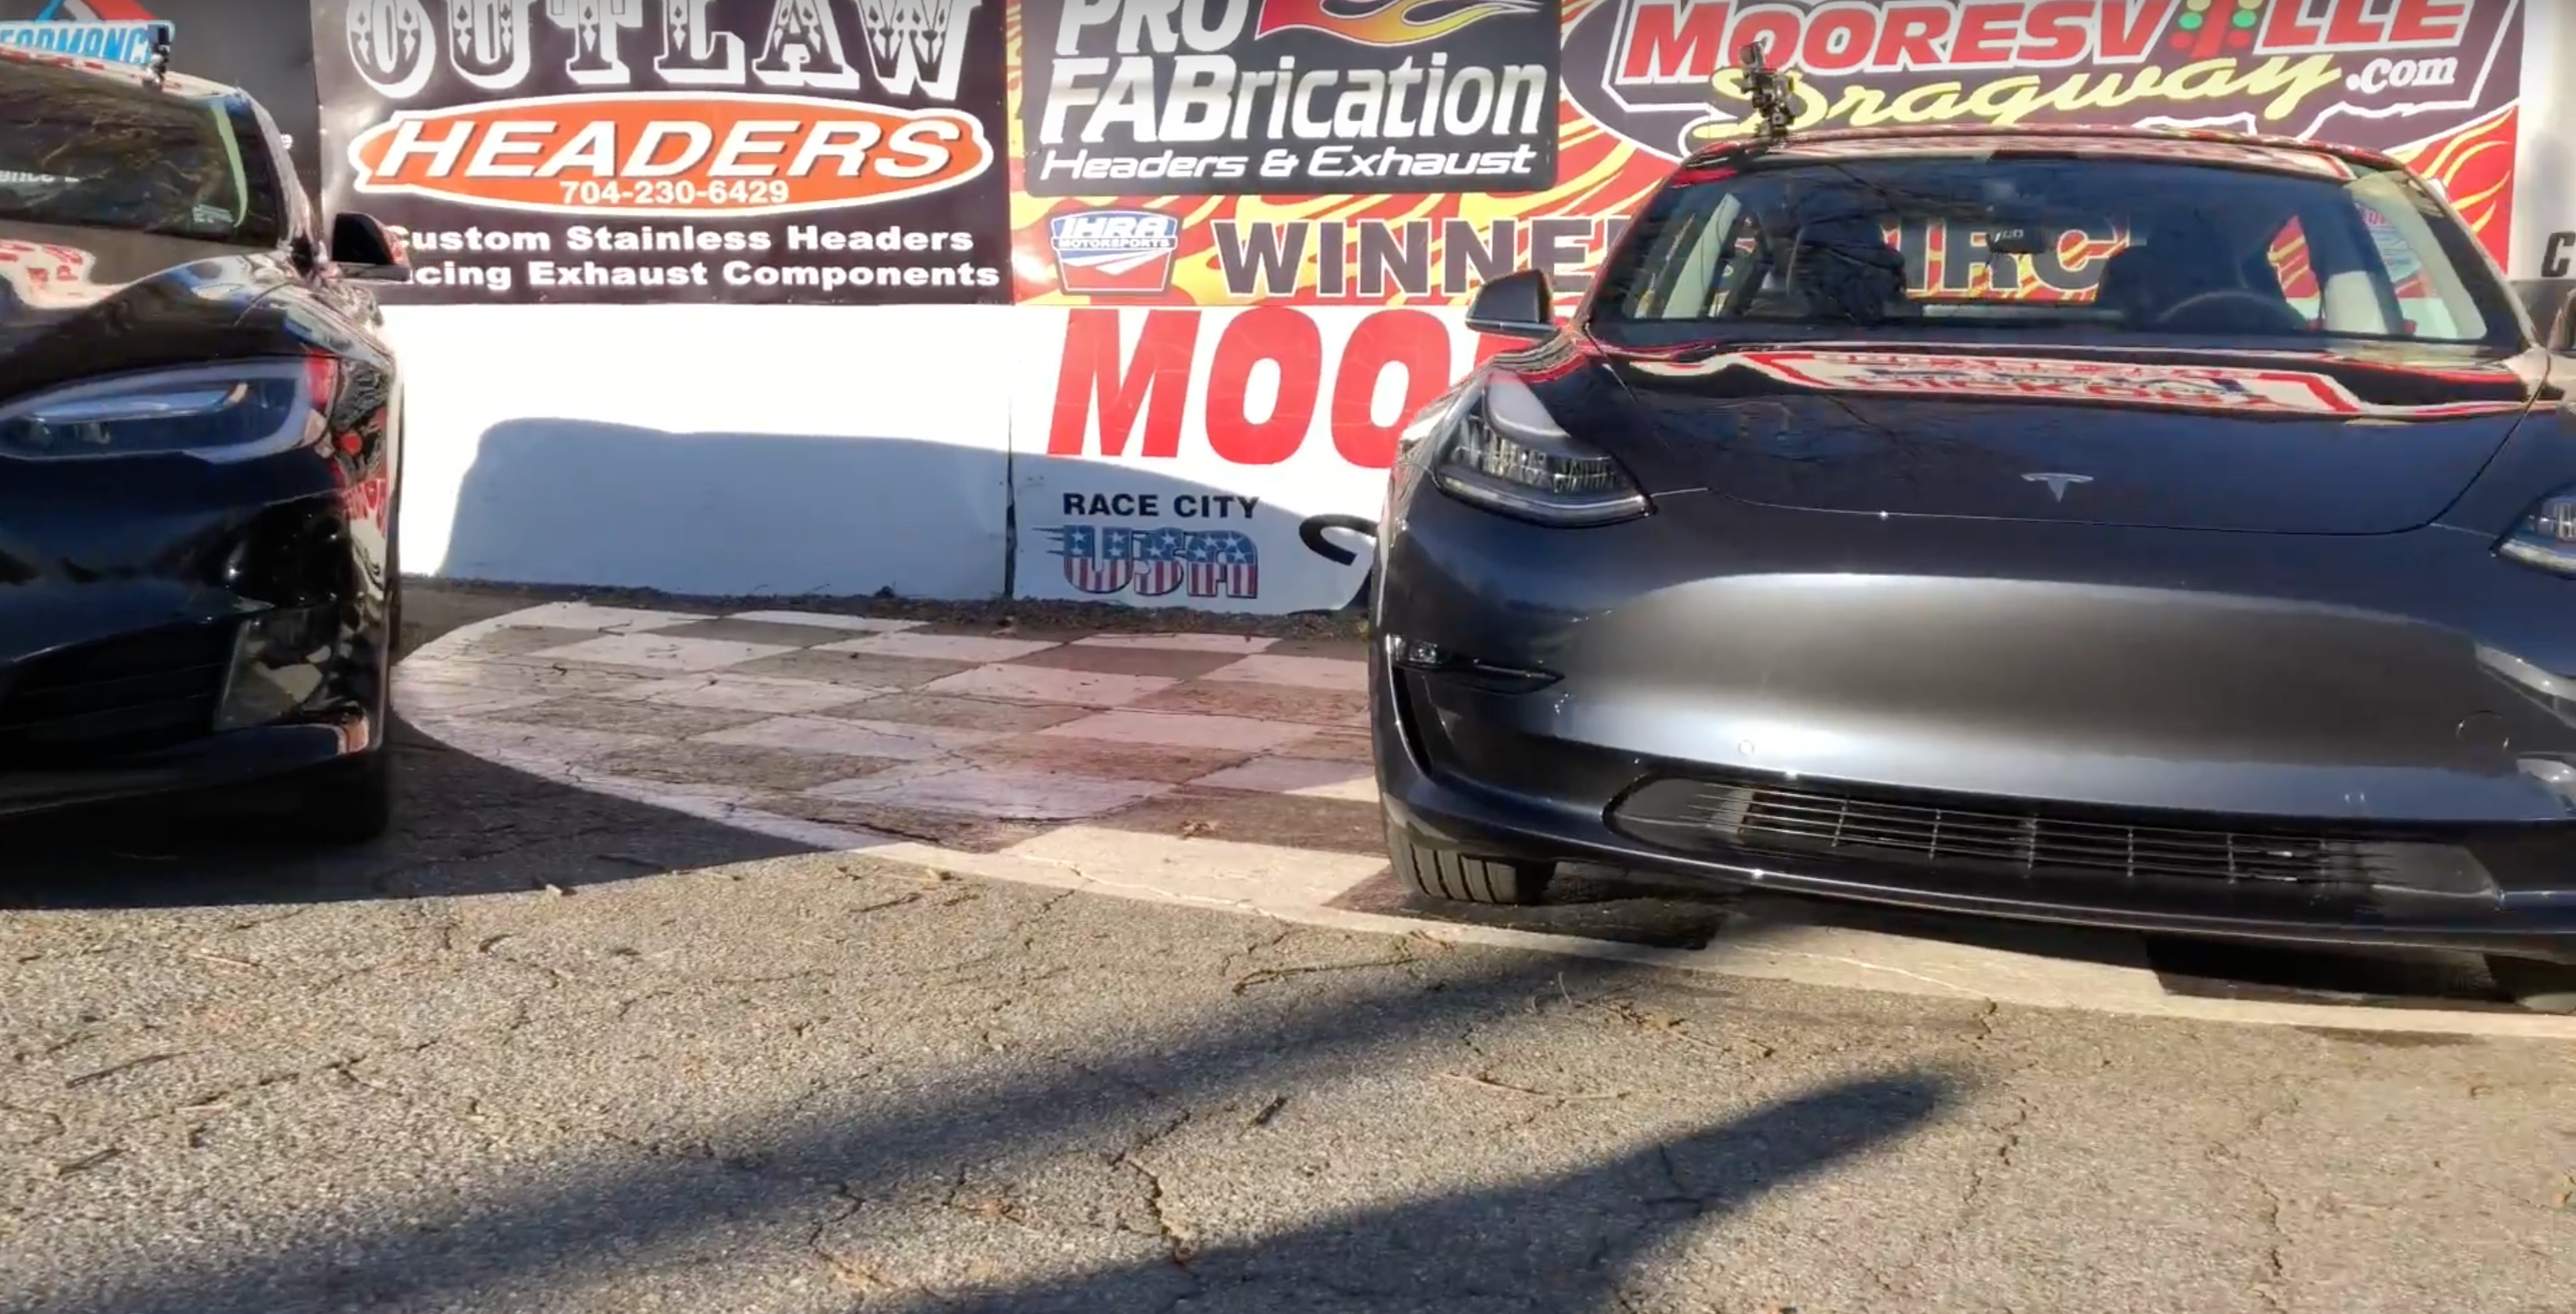 tesla-model-3-drag-race-vs-model-s-75d